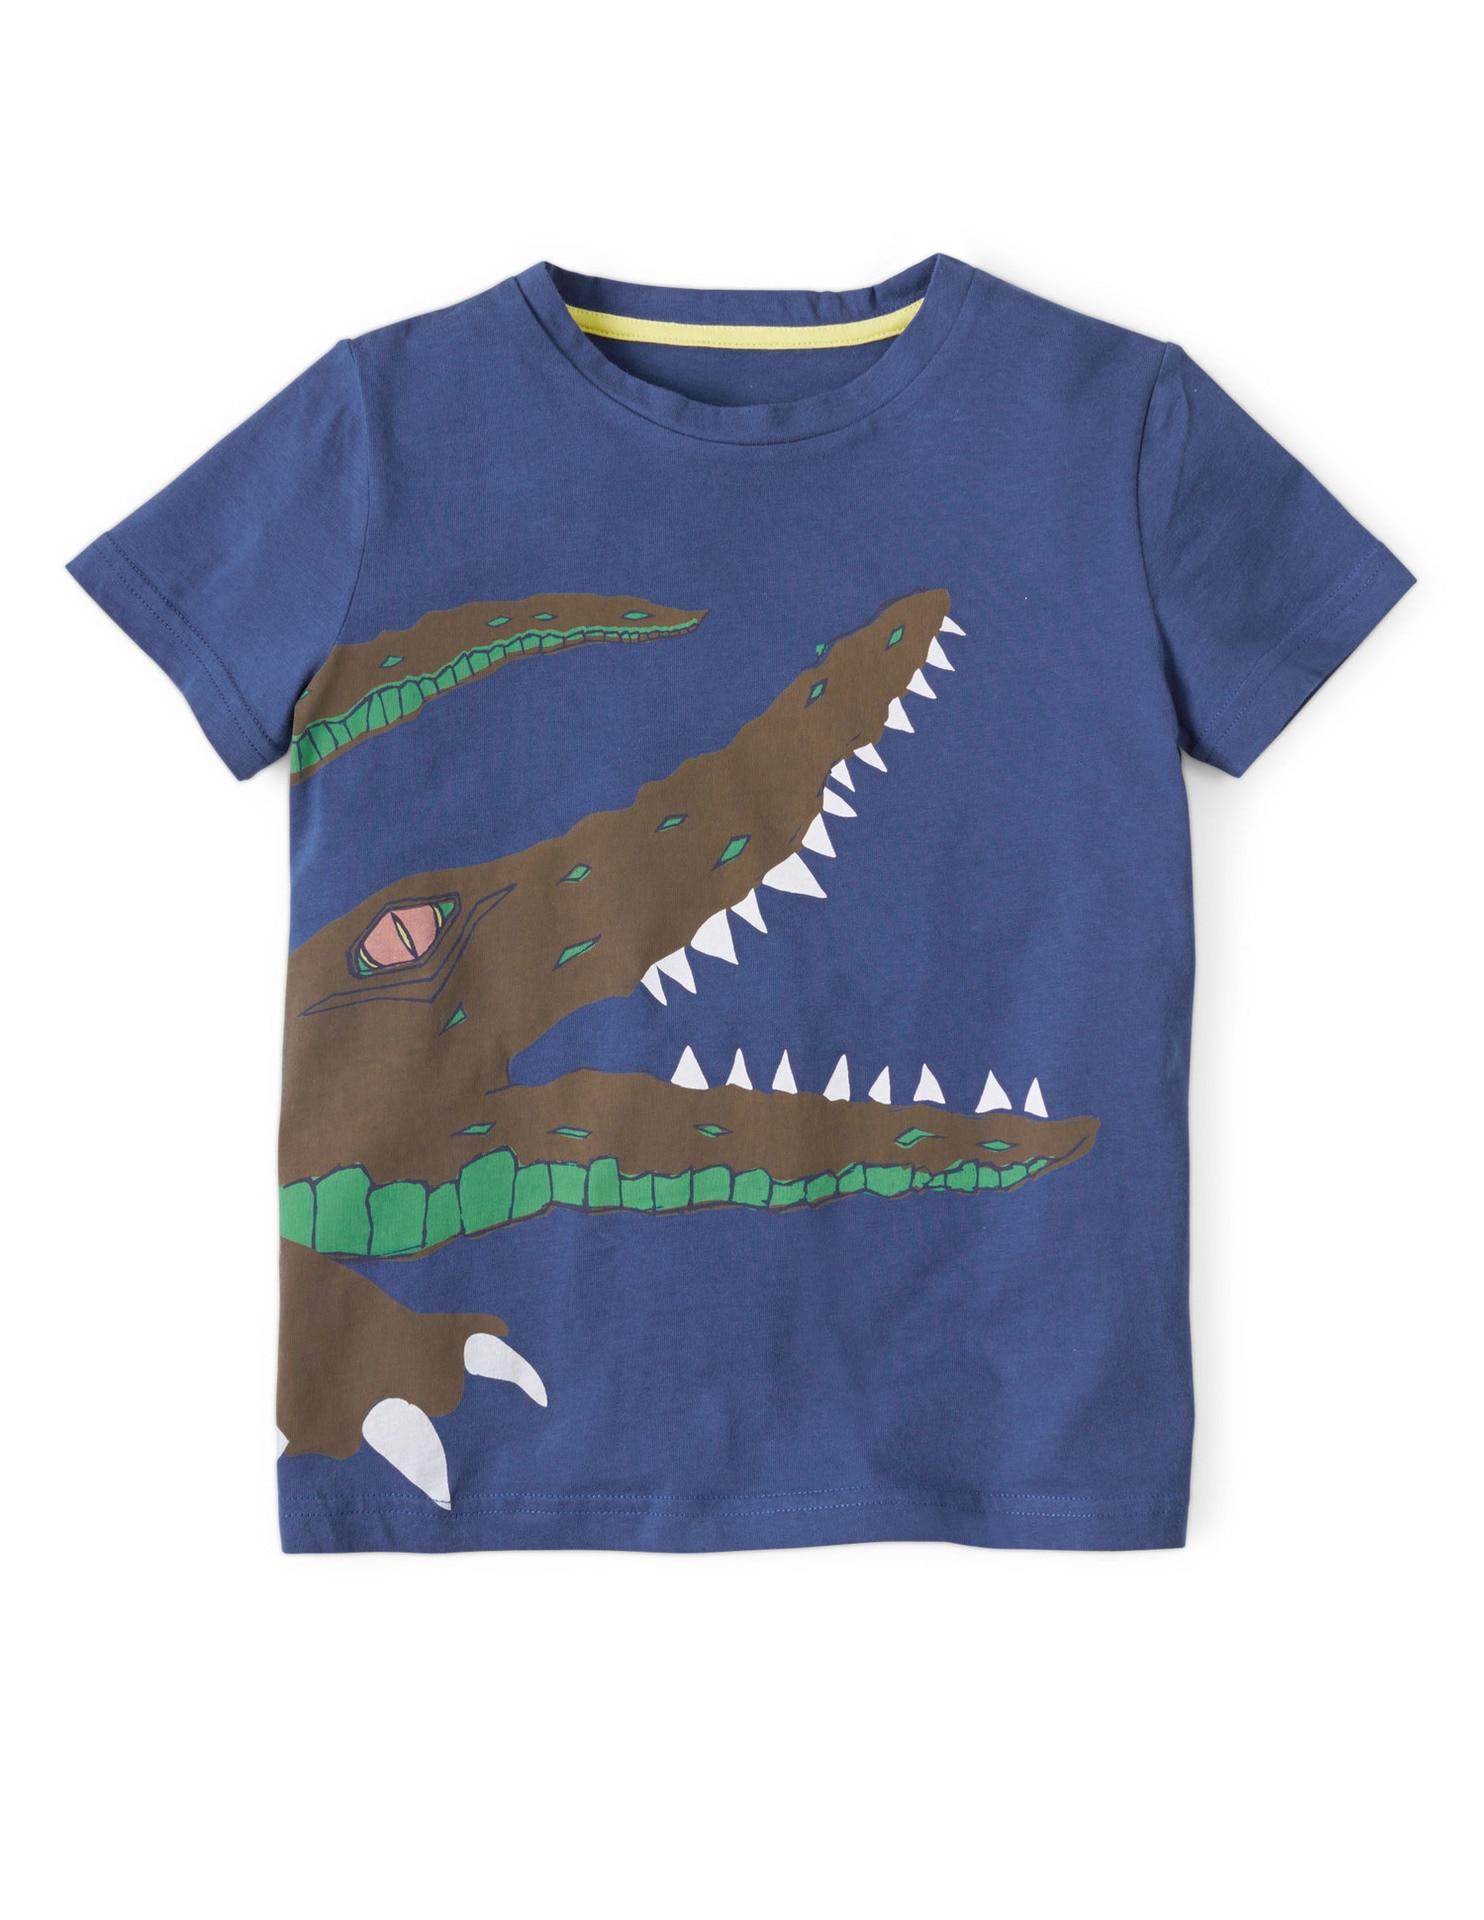 V-TREE-Childrens-T-shirt-Cartoon-boys-t-shirt-Baby-Summer-shirt-Tees-for-girls-Designer-Cotton-Baby-Clothing-3